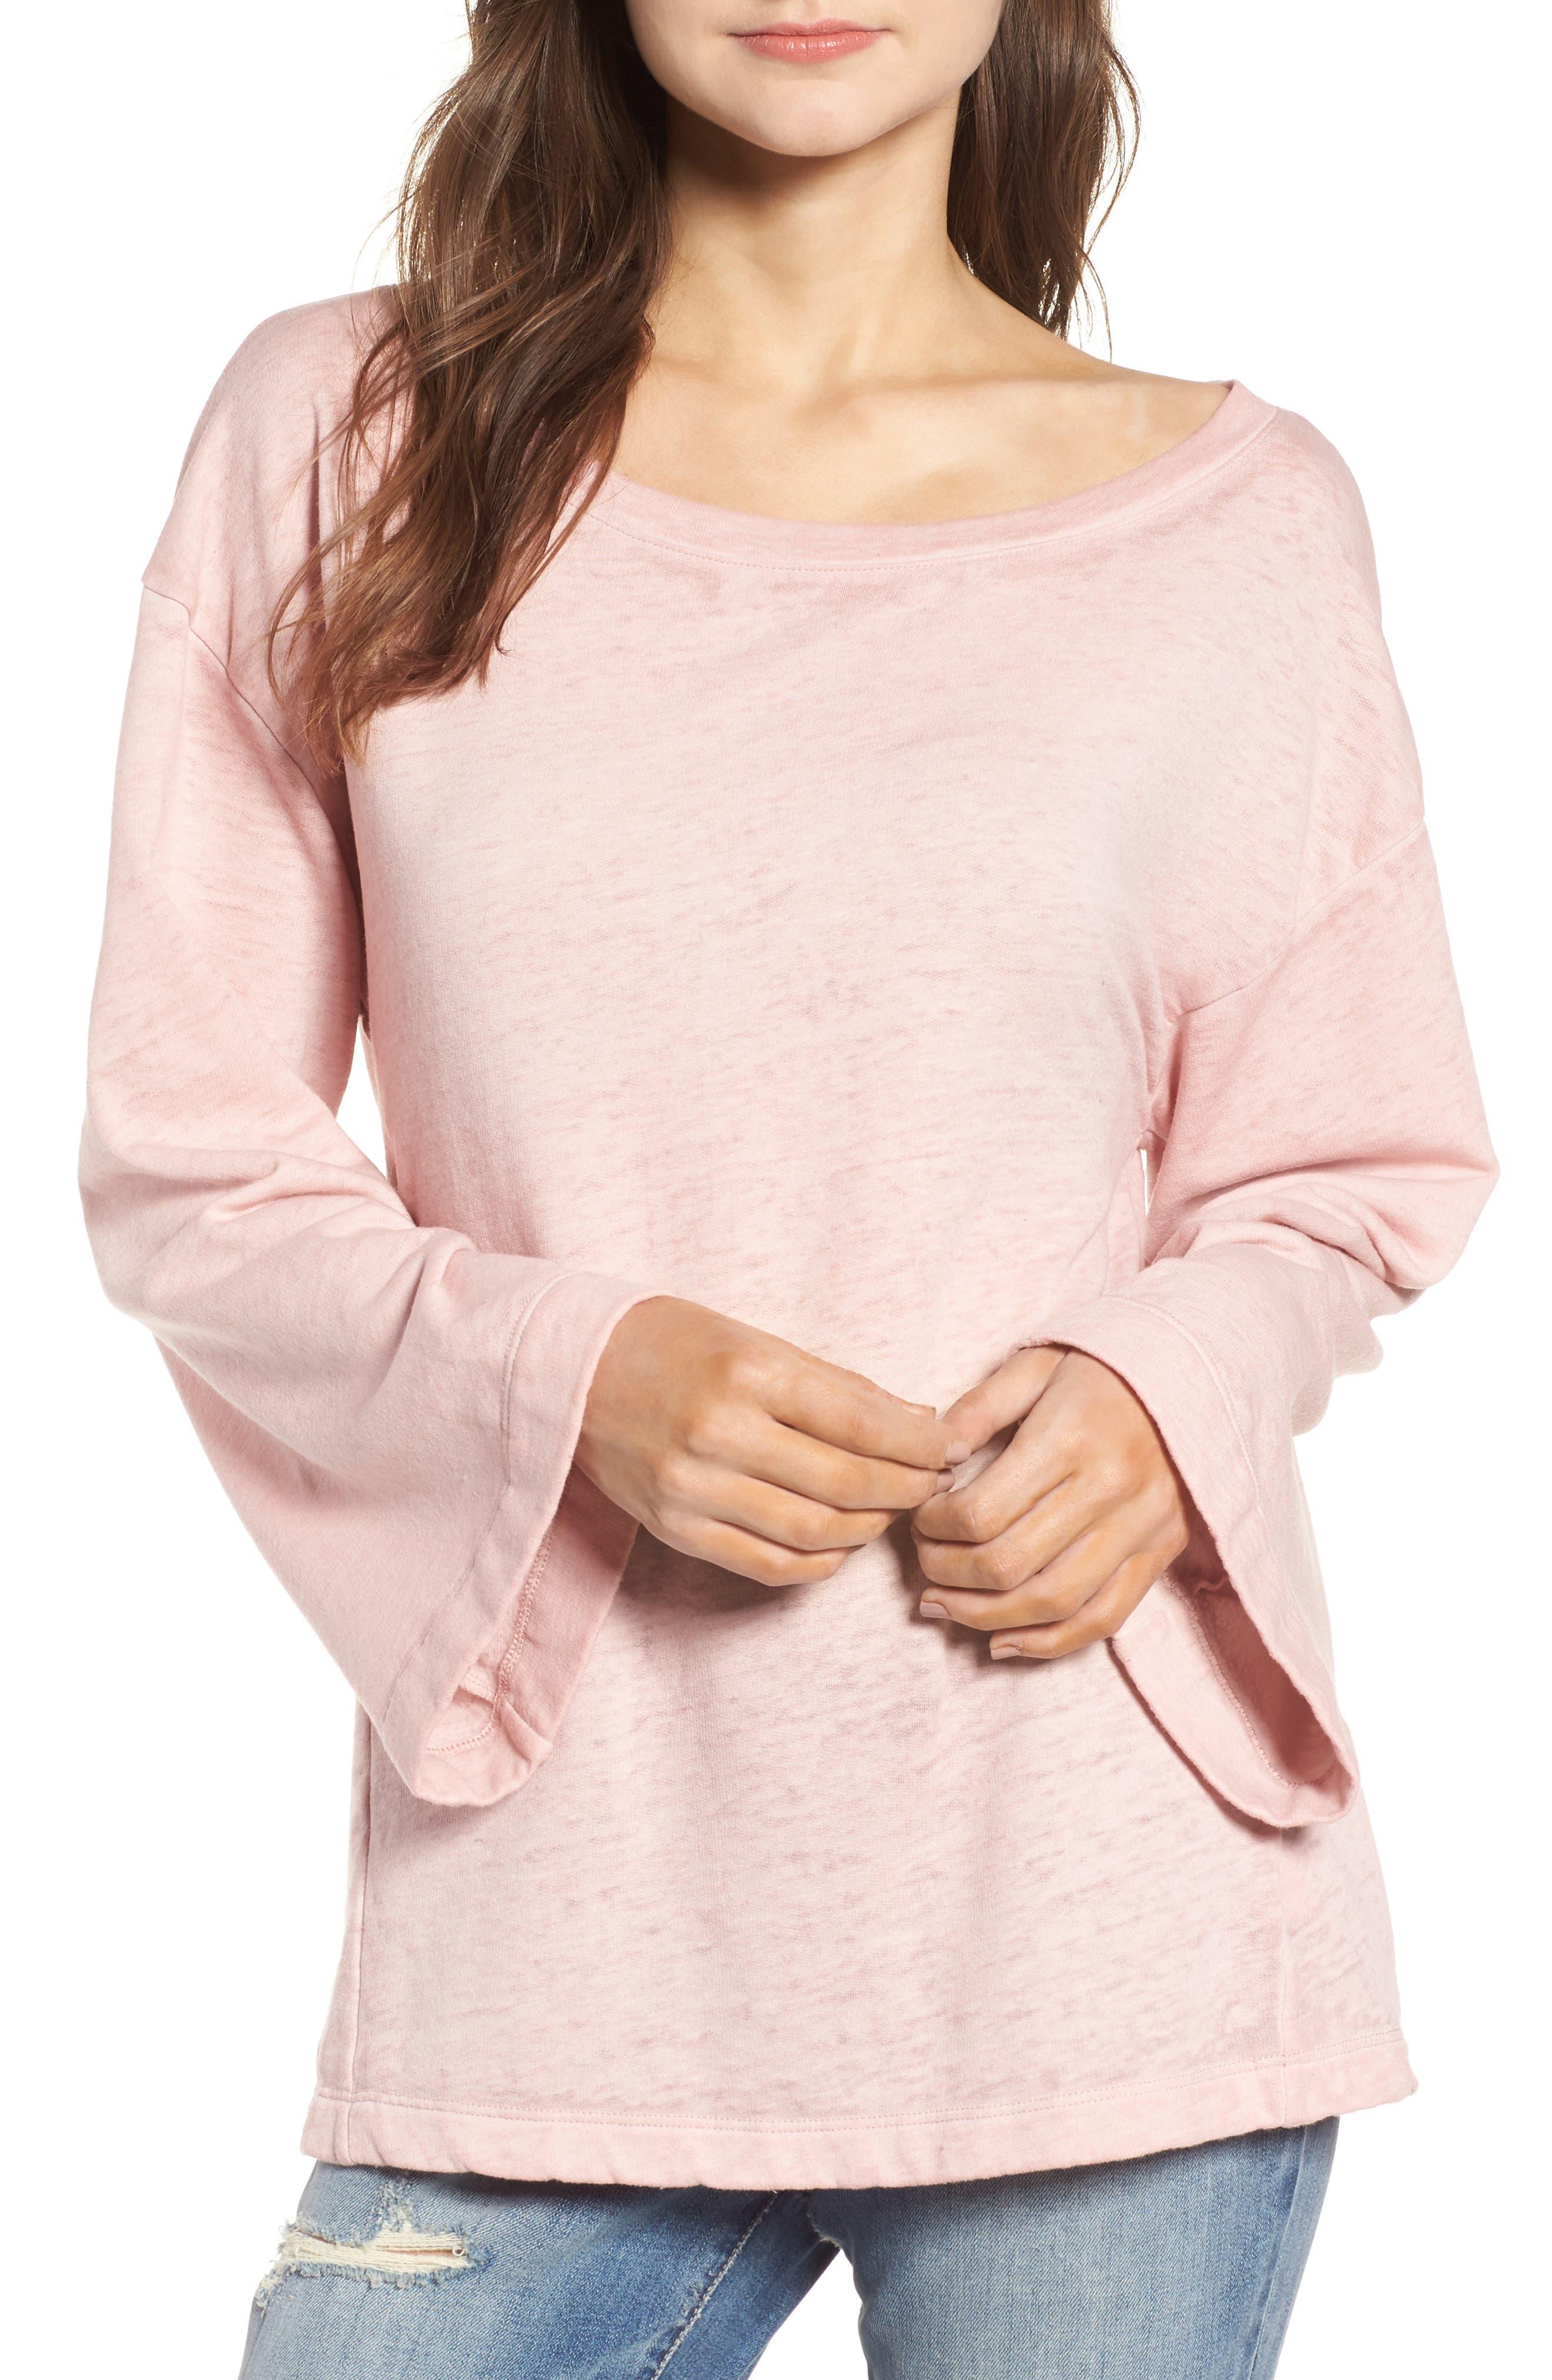 Bell Sleeve Sweatshirt,                         Main,                         color, Pink Silver